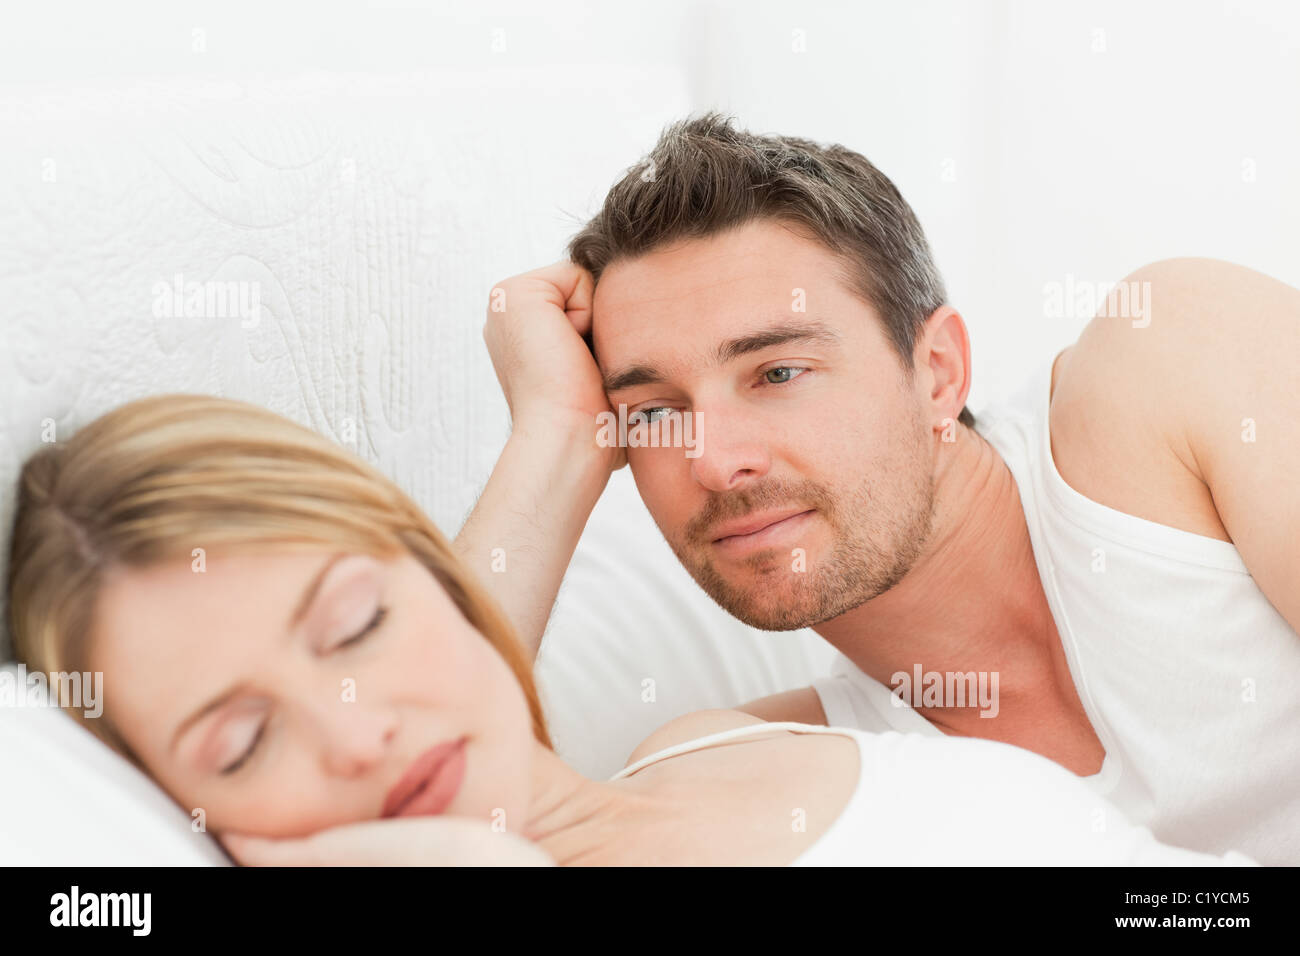 Boyfriend looking at his girlfriend who is  sleeping - Stock Image